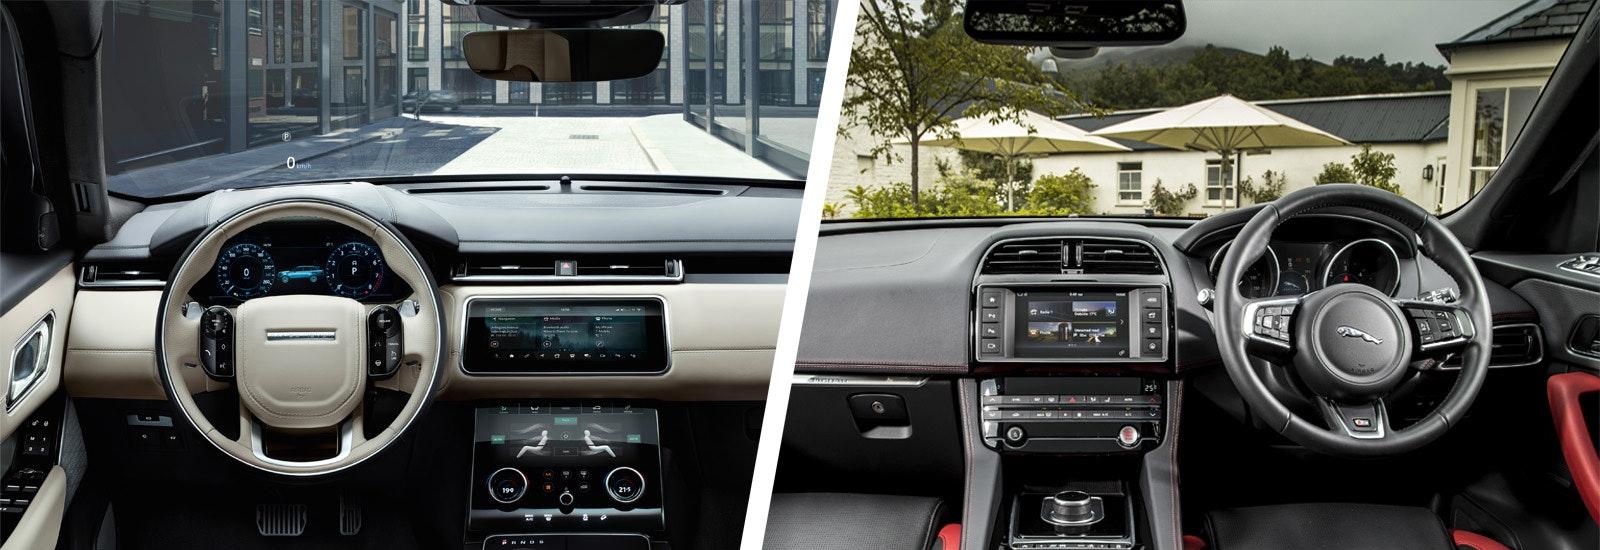 Range Rover Velar Vs Jaguar F Pace Suv Comparison Carwow